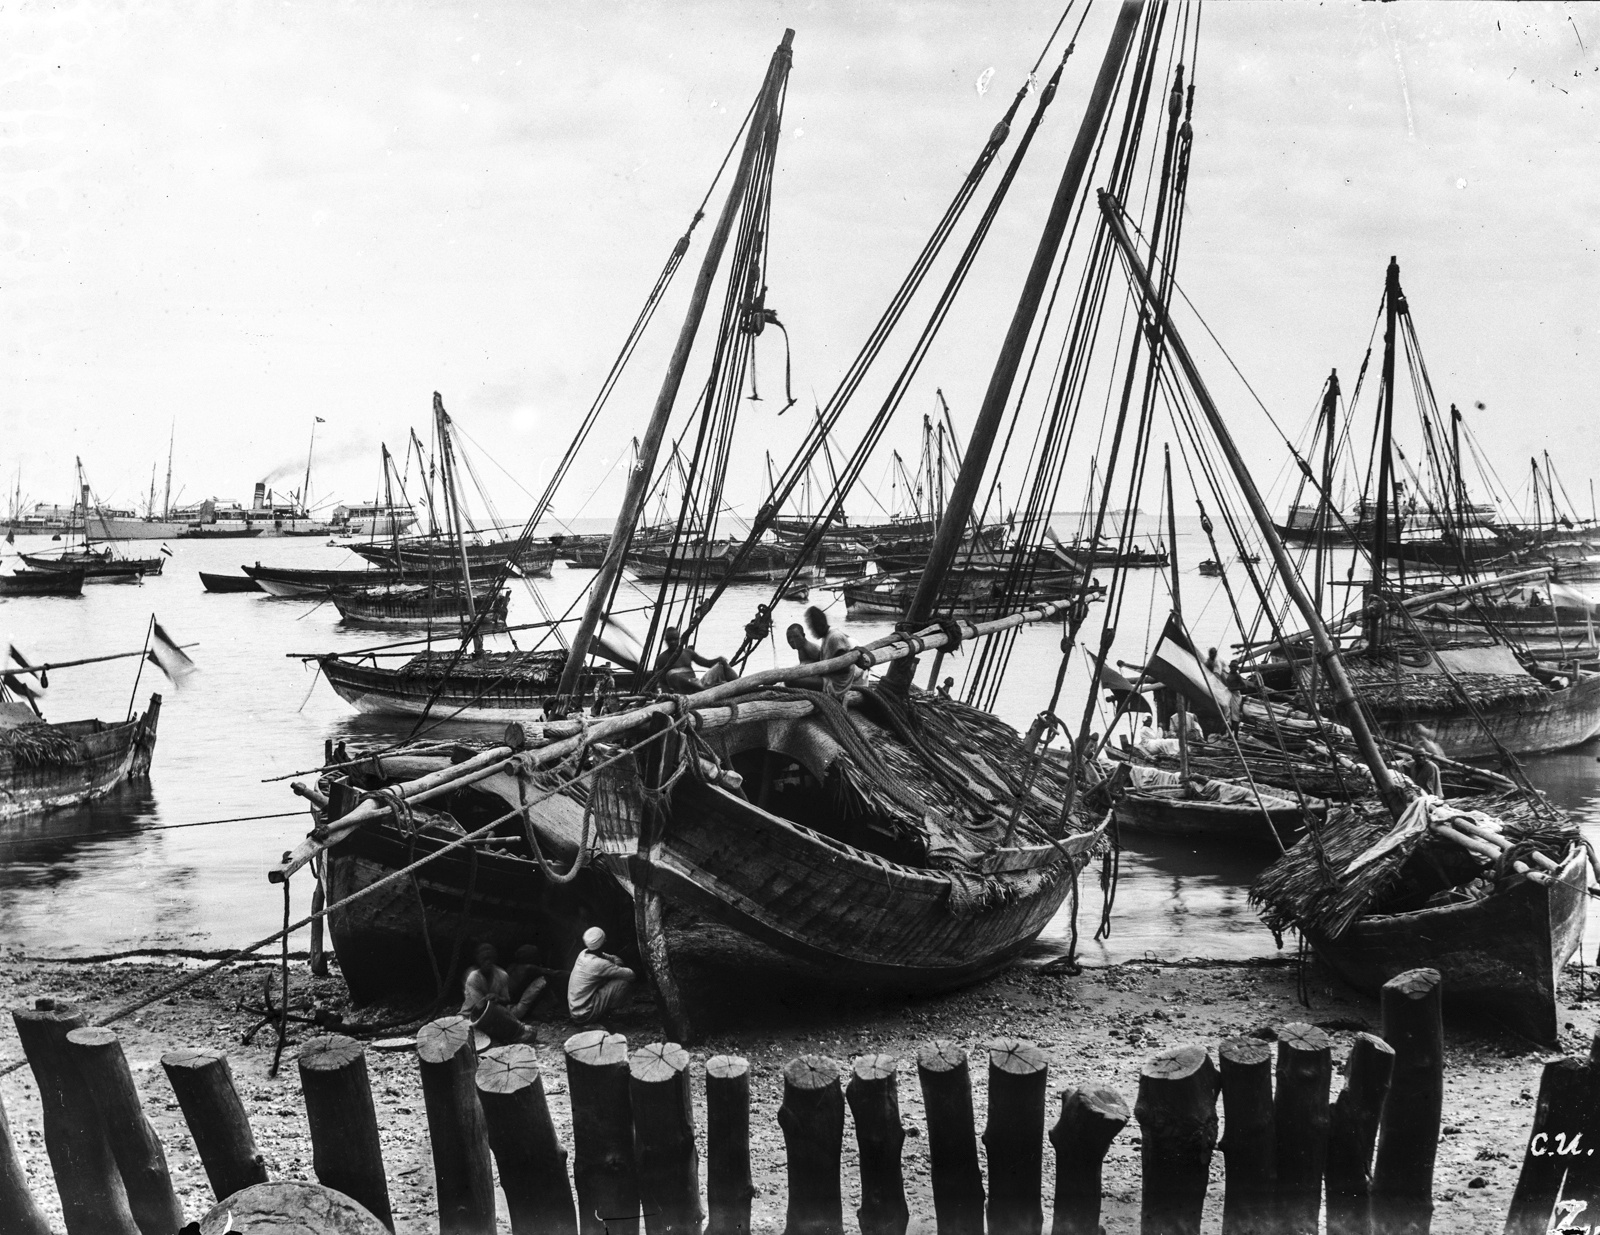 164. Вид на берег и большое количество морских судов в Дар-эс-Саламе